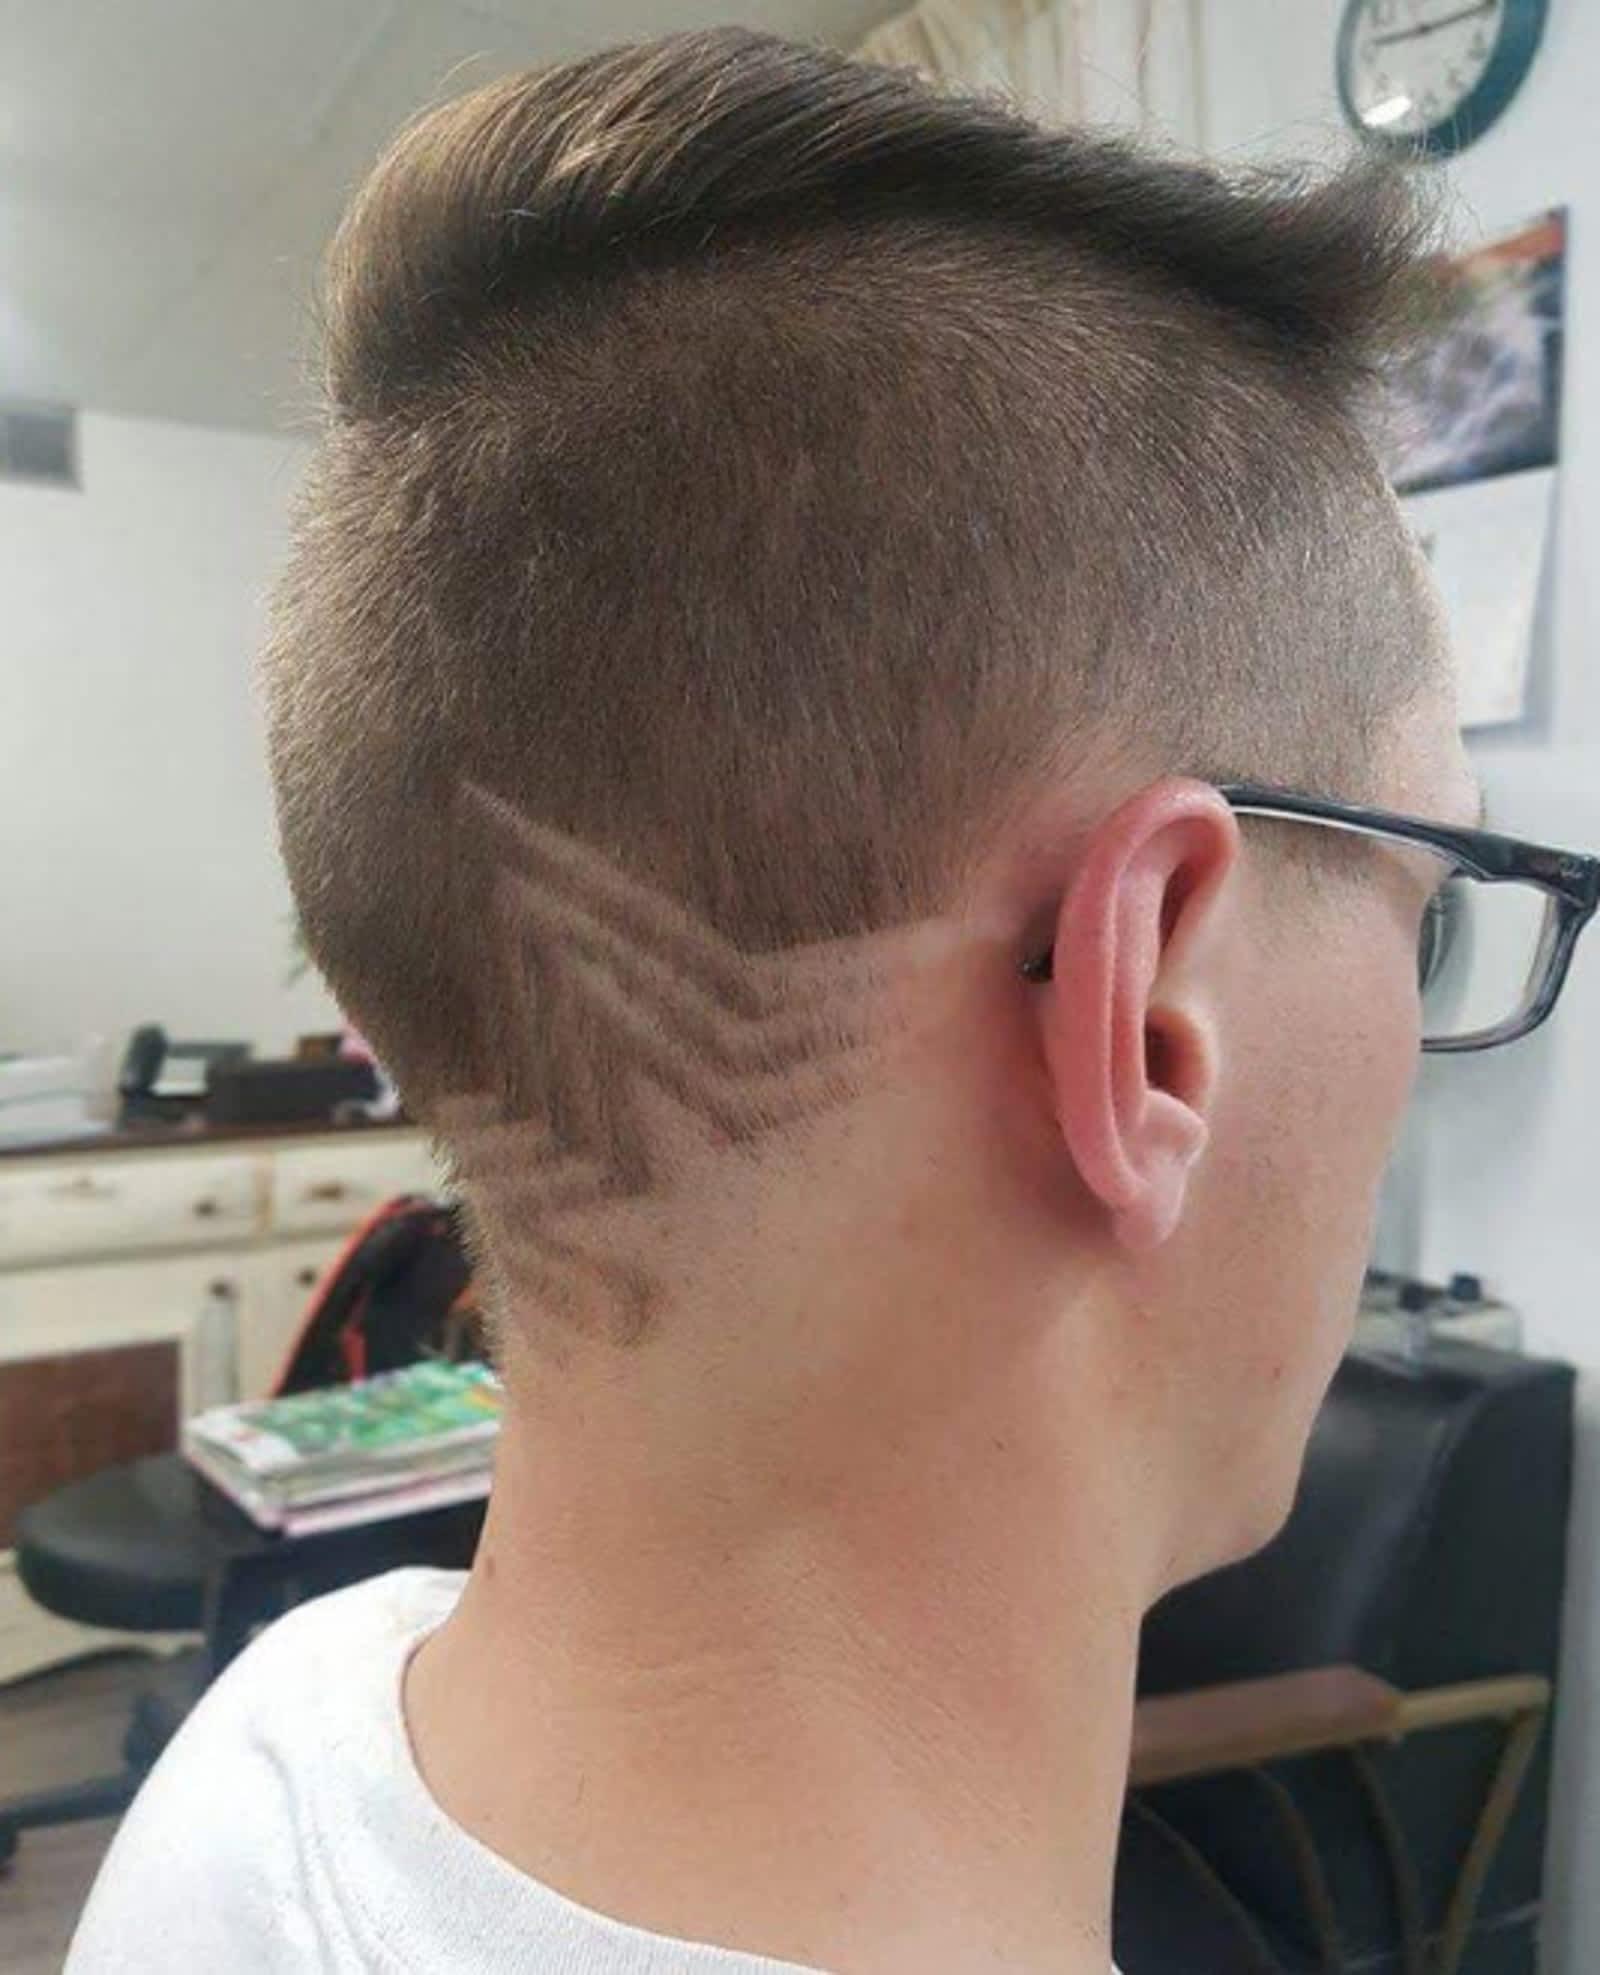 Badlands Hair Studio and Spa 220 Main St, Bengough